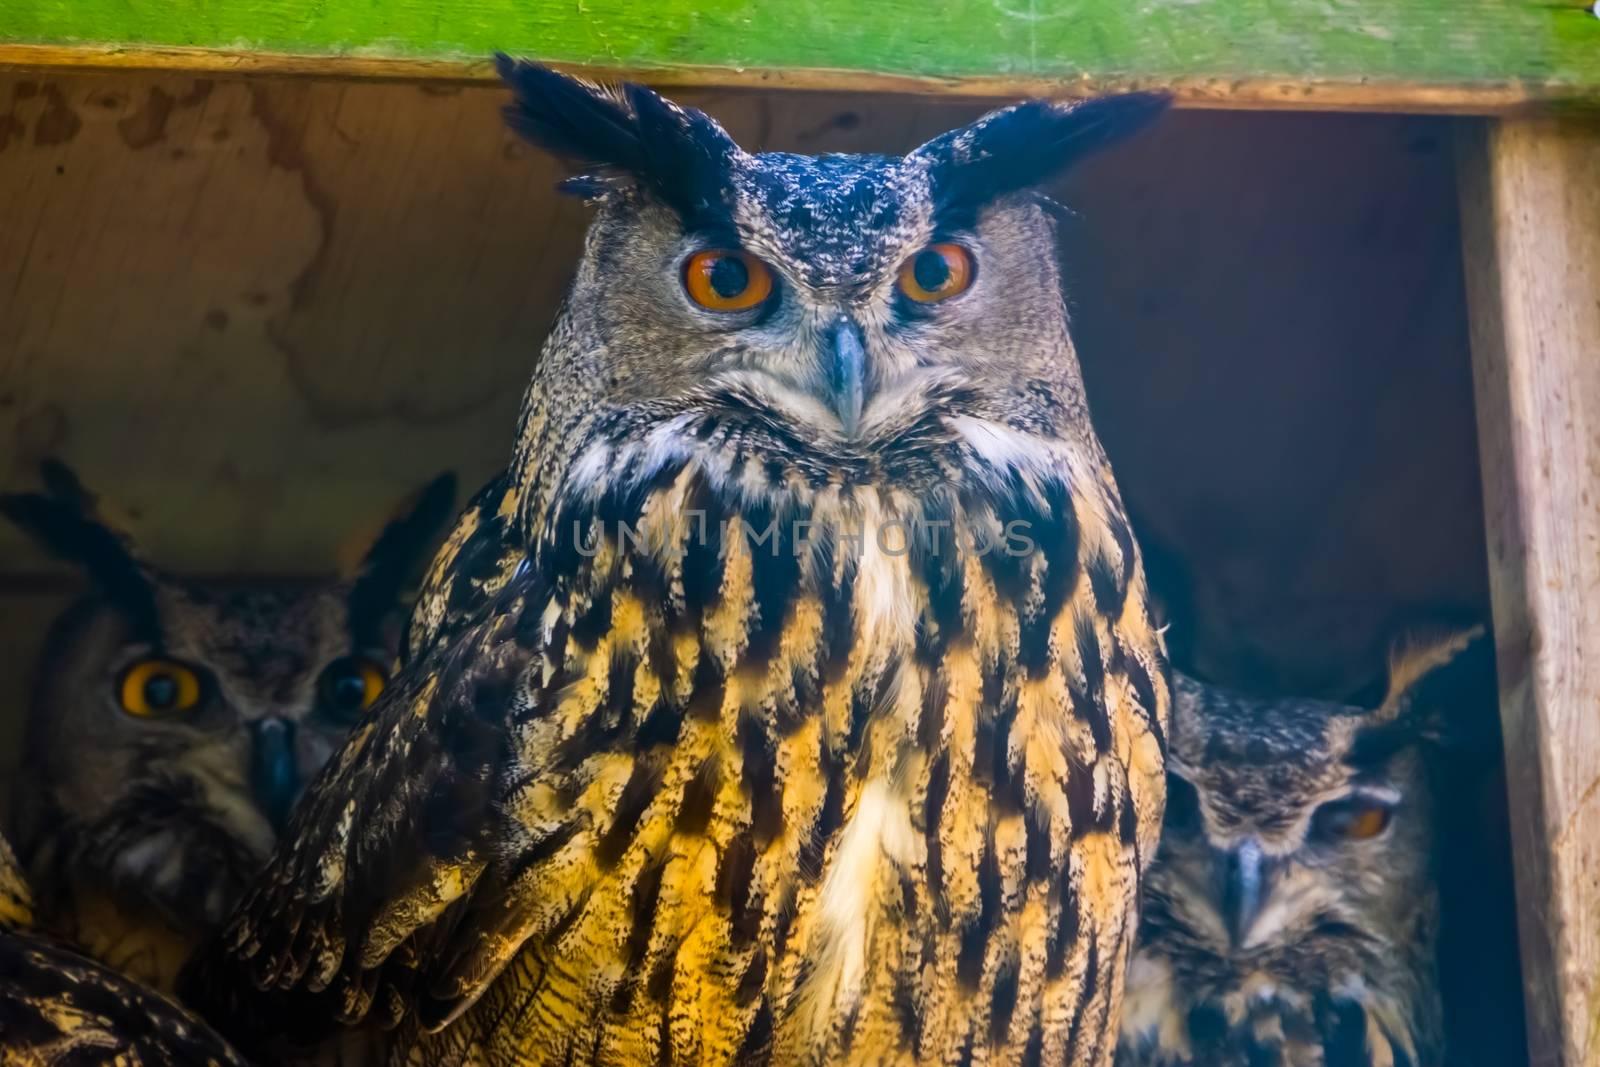 beautiful closeup portrait of a eurasian eagle owl, popular bird specie form Eurasia